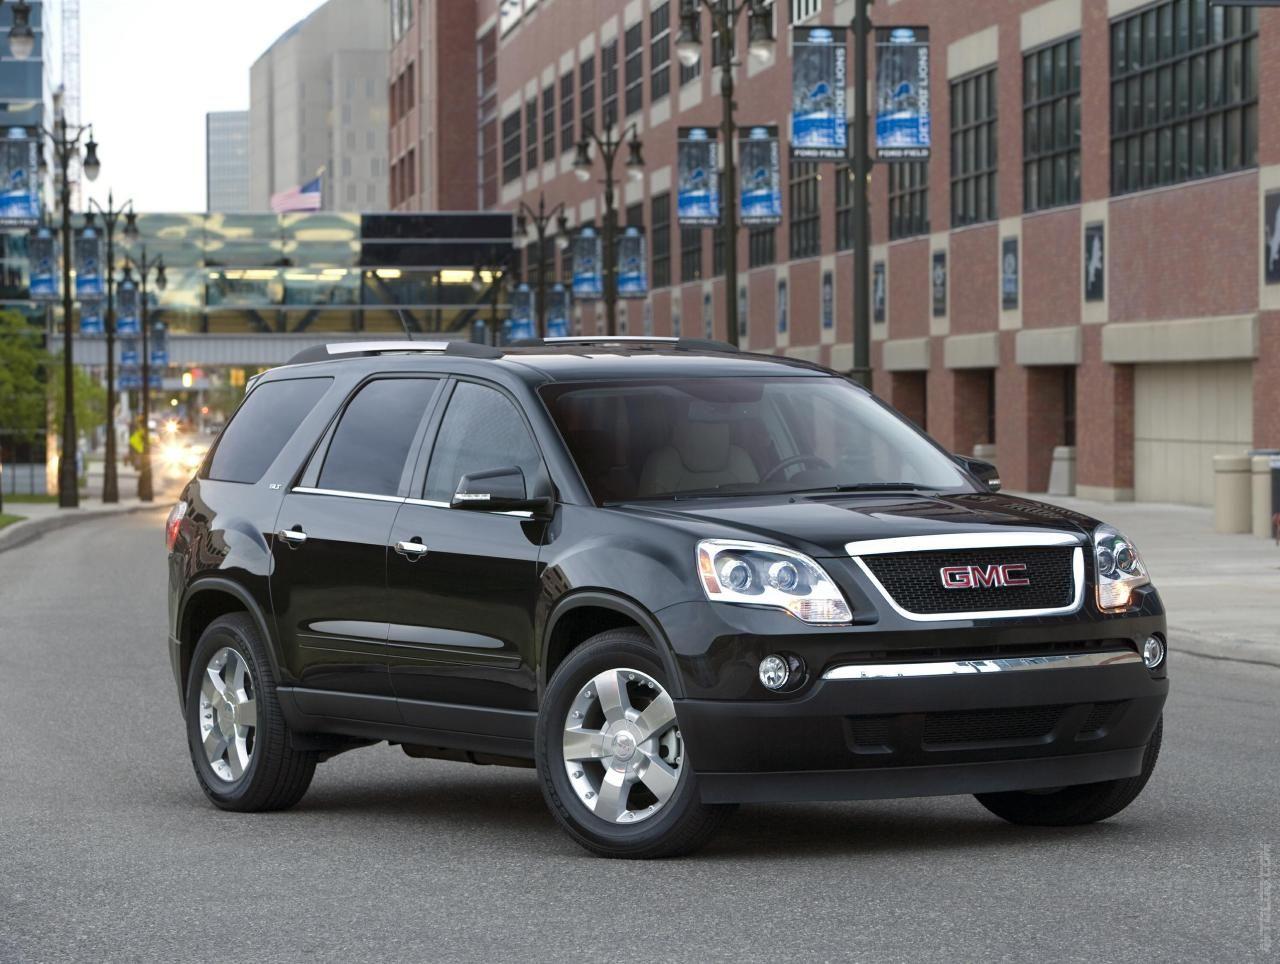 2013 Gmc Acadia My Dream Suv Safest Suv Gmc Vehicles Suv